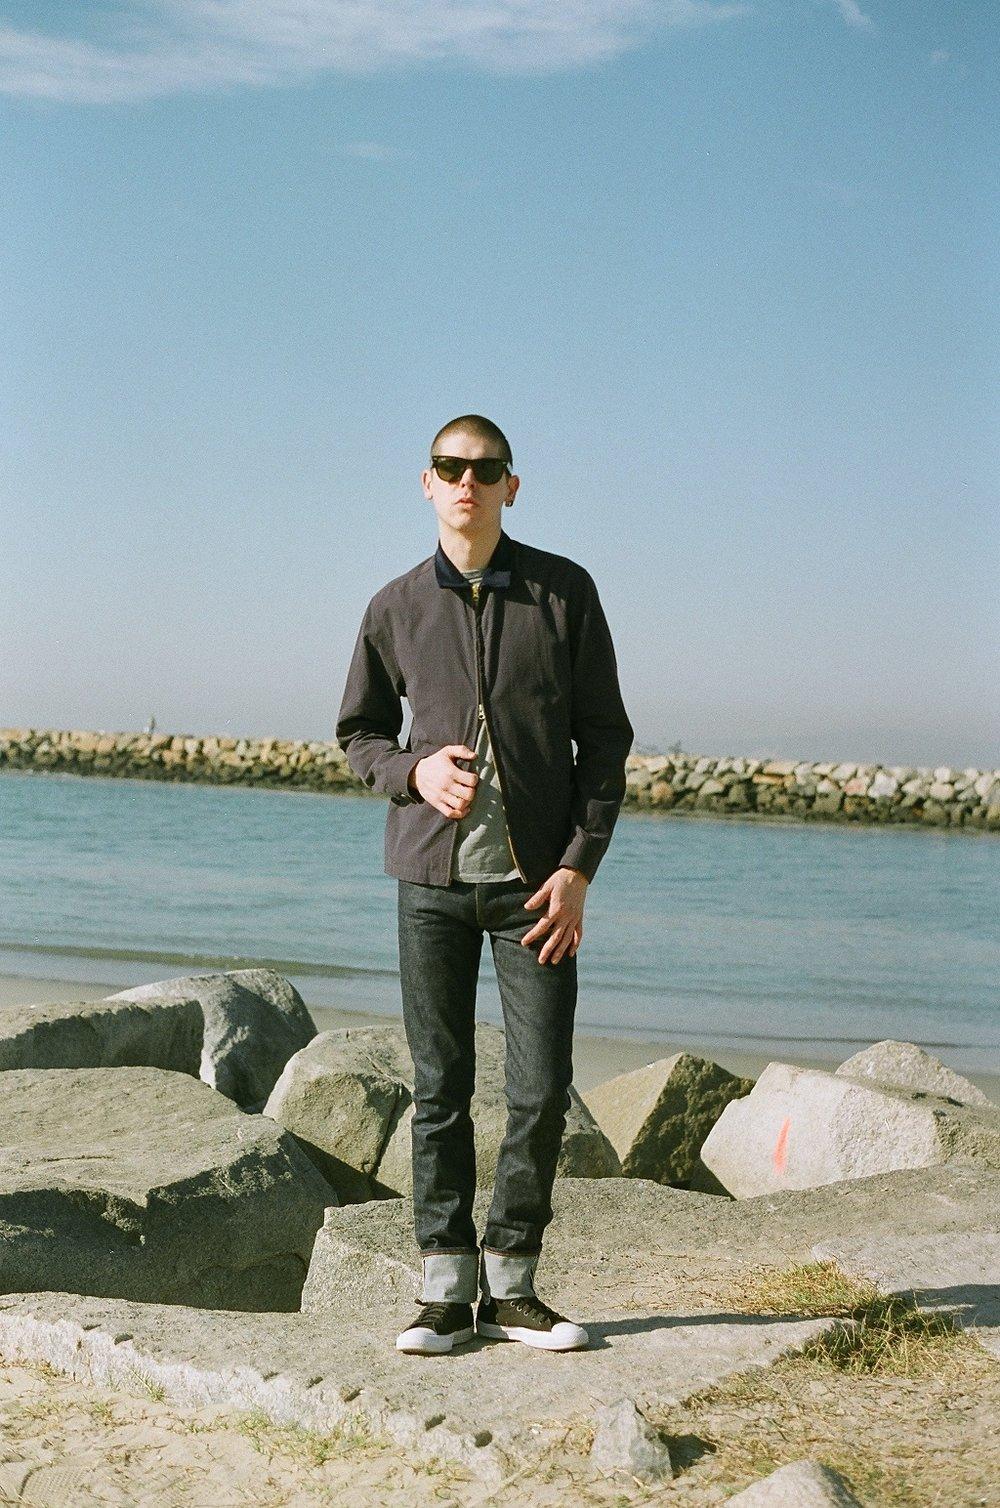 seal-beach-california-ray-bay-film-33mm-film-film-photography-menswear-santana-social-club-surf-raw-denim-made-in-usa-cotton-ripstop-jacket.JPG